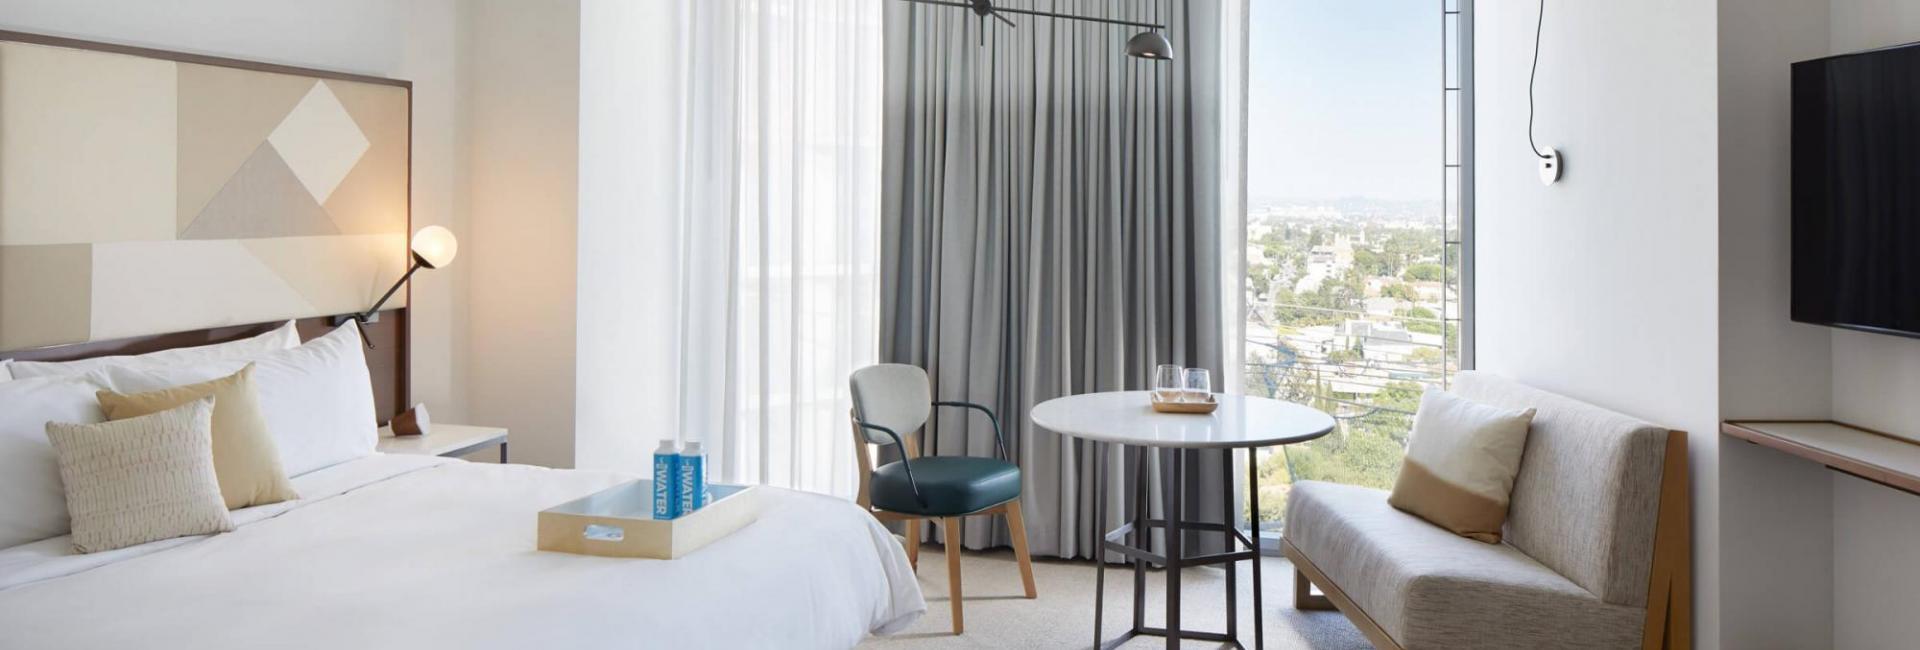 Skyline King suite at Jeremy Hotel West Hollywood